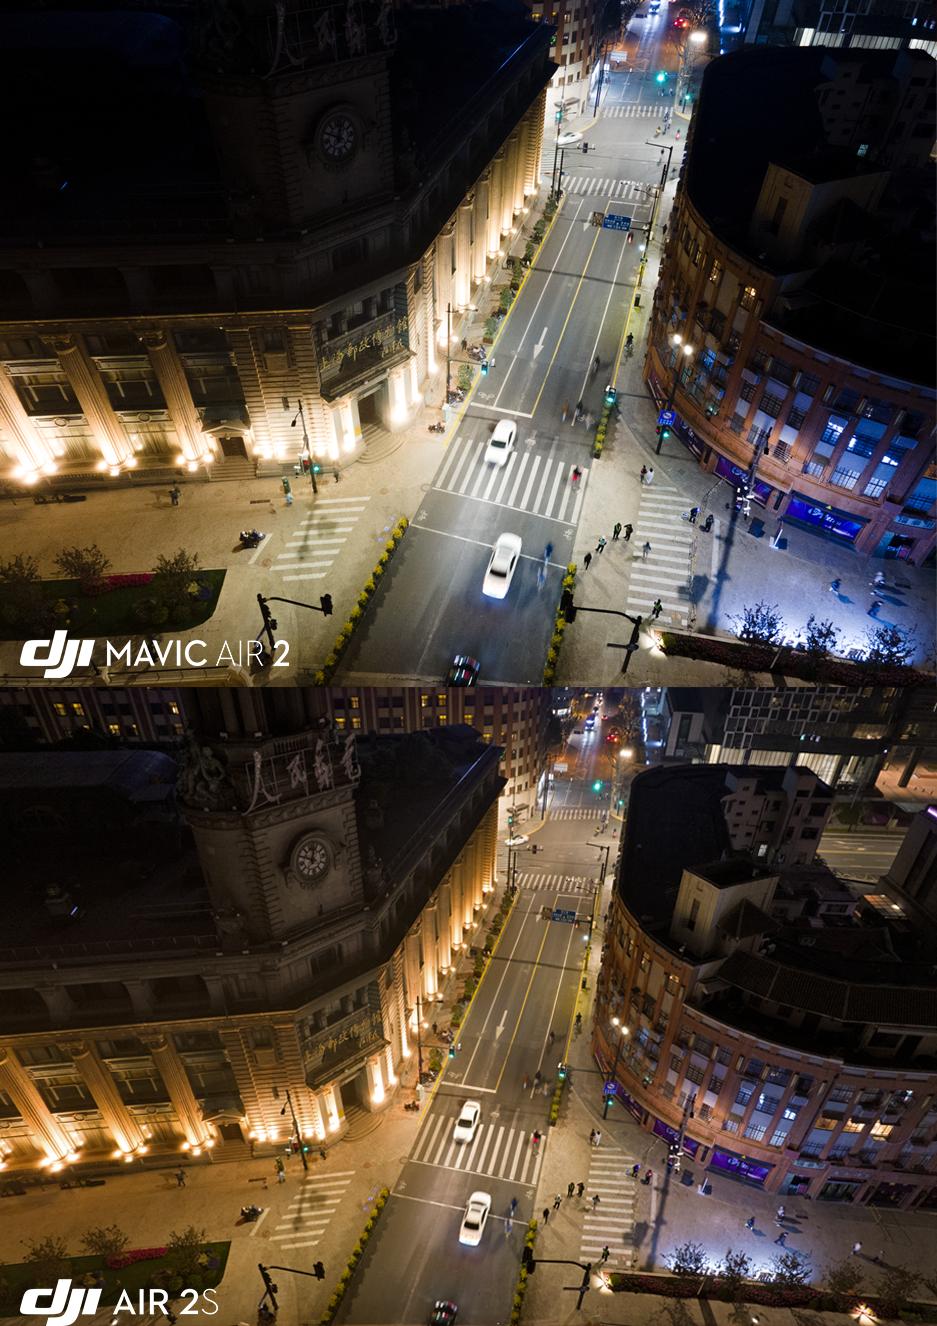 DJI Air 2SはDJI Mavic Air 2に比べ暗部をより鮮明に捉えることが可能です